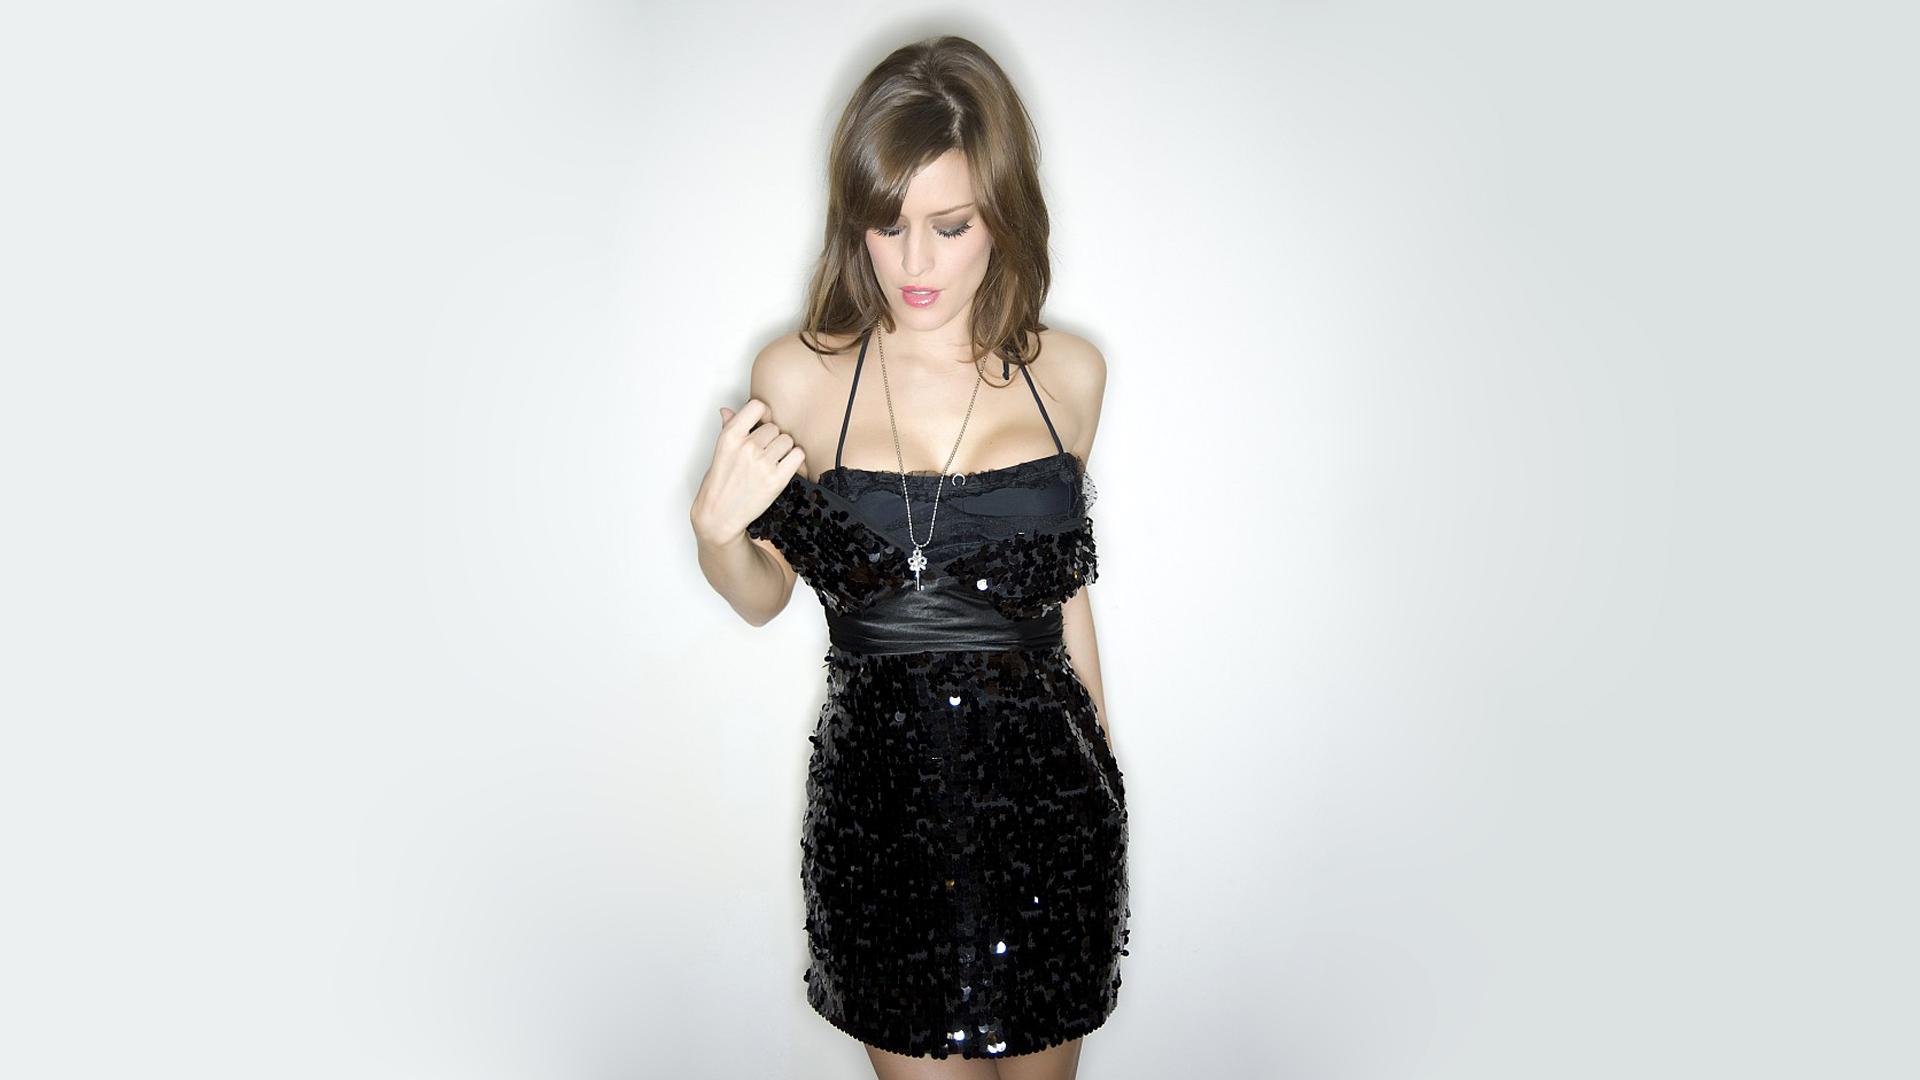 Wallpaper Femme Model Simple Background Dress Brunette